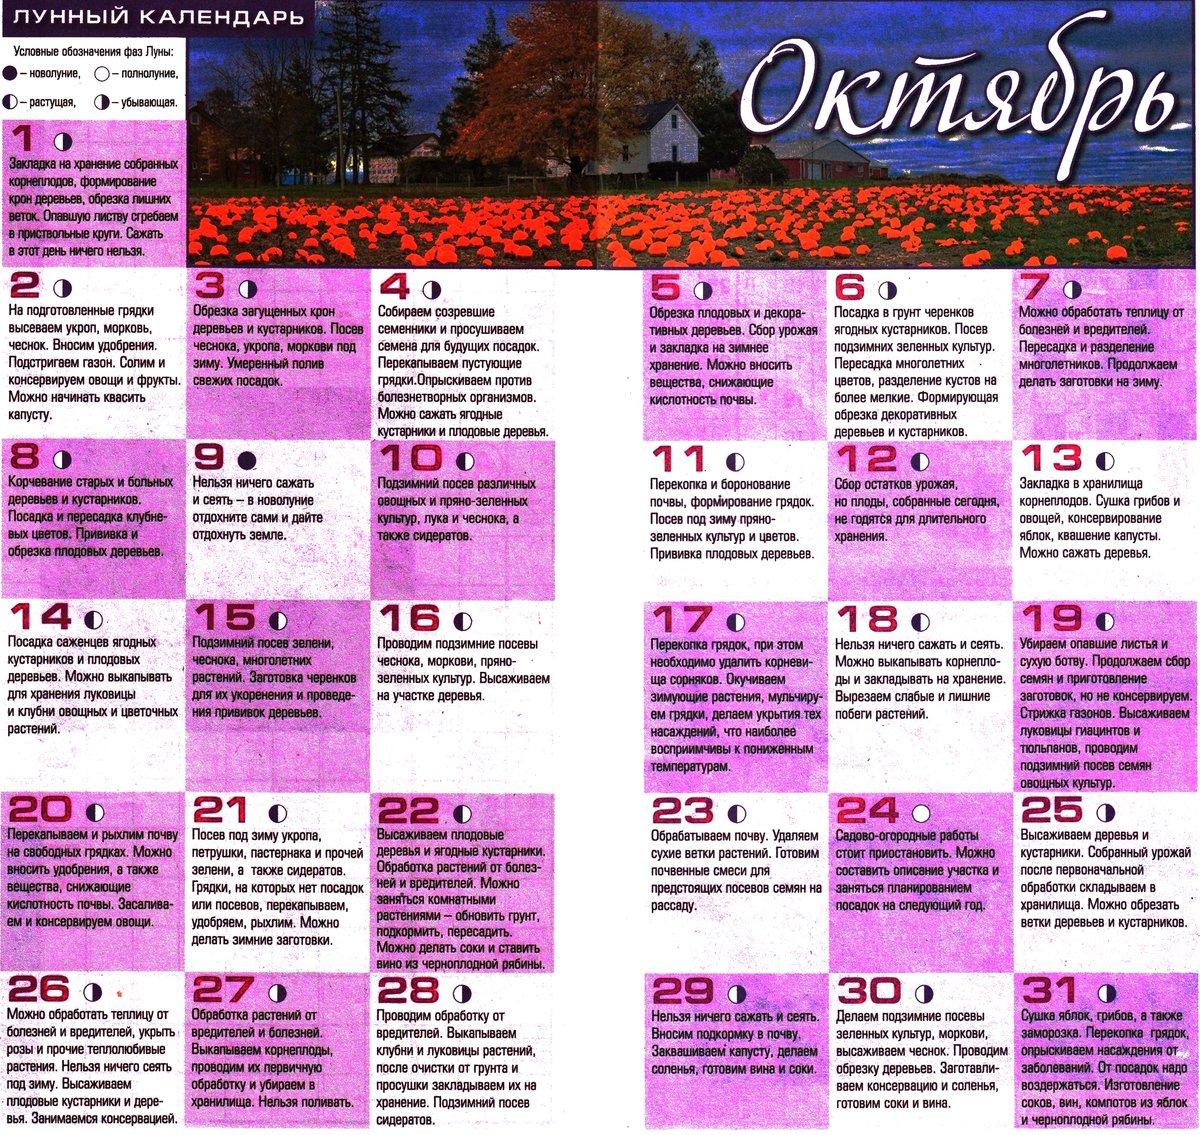 лунный календарь на октябрь фото картинка рабочий